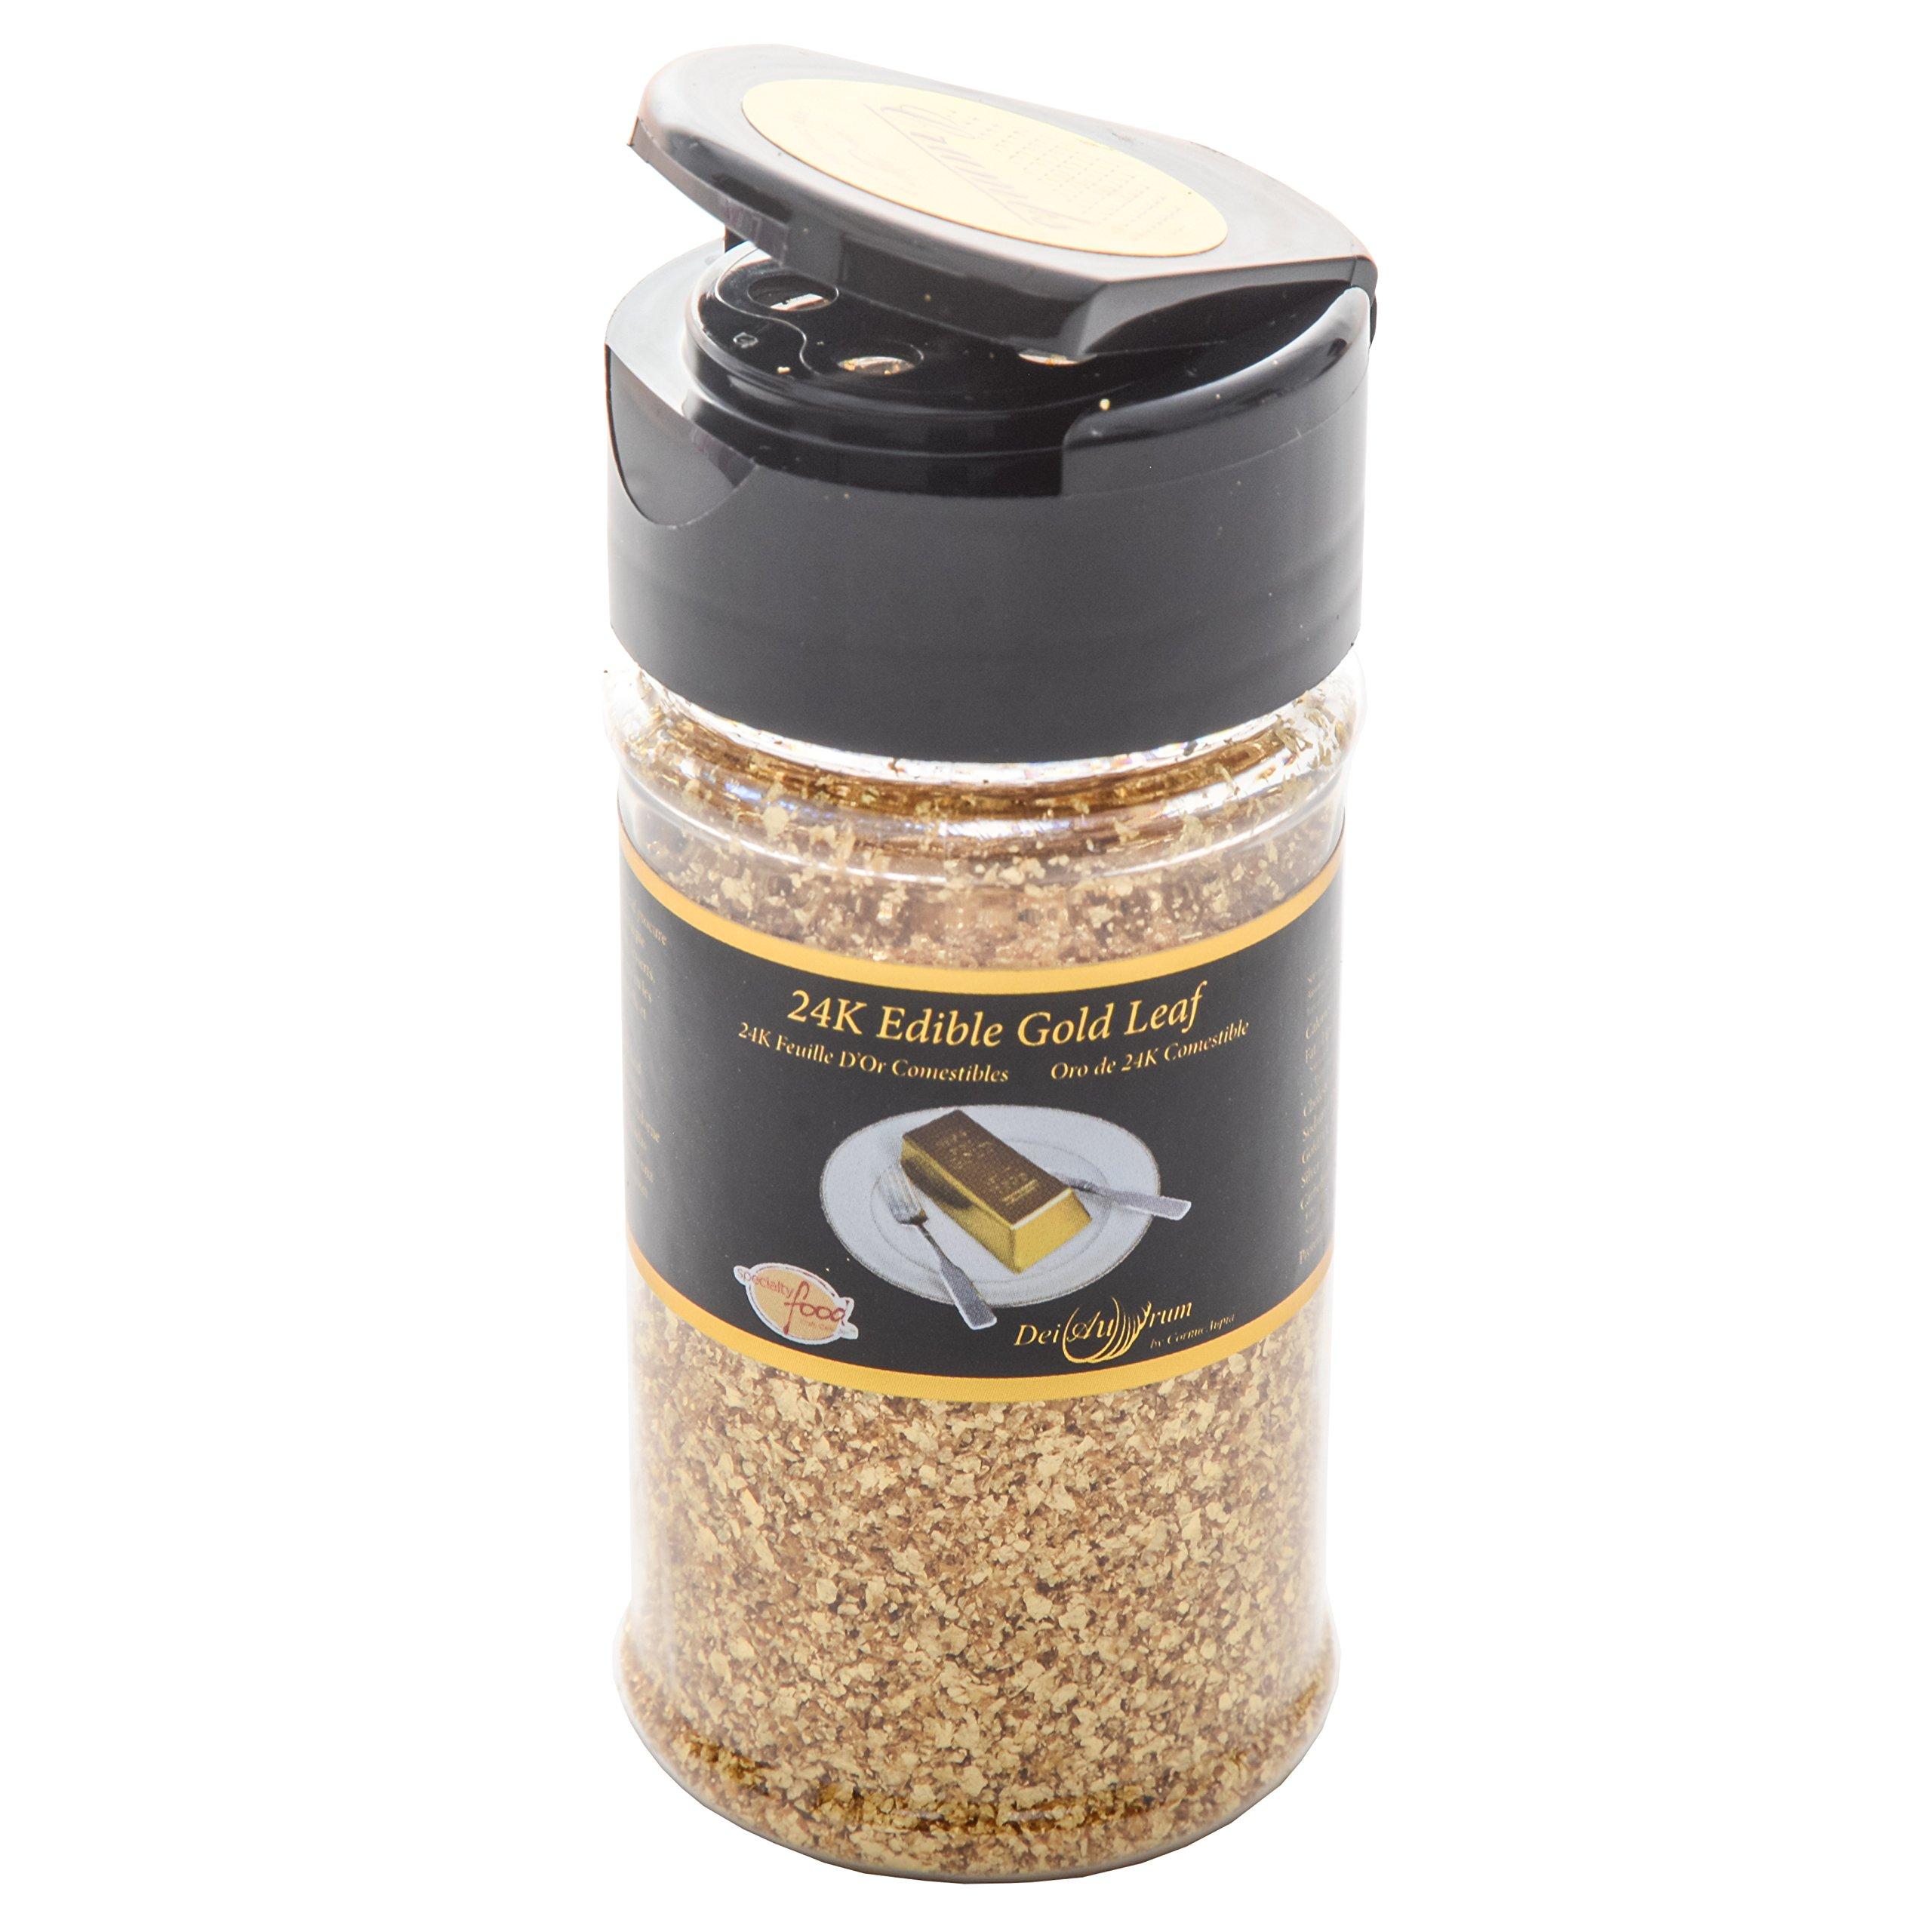 24K Edible Gold Leaf Crumbs, Shaker, 1g